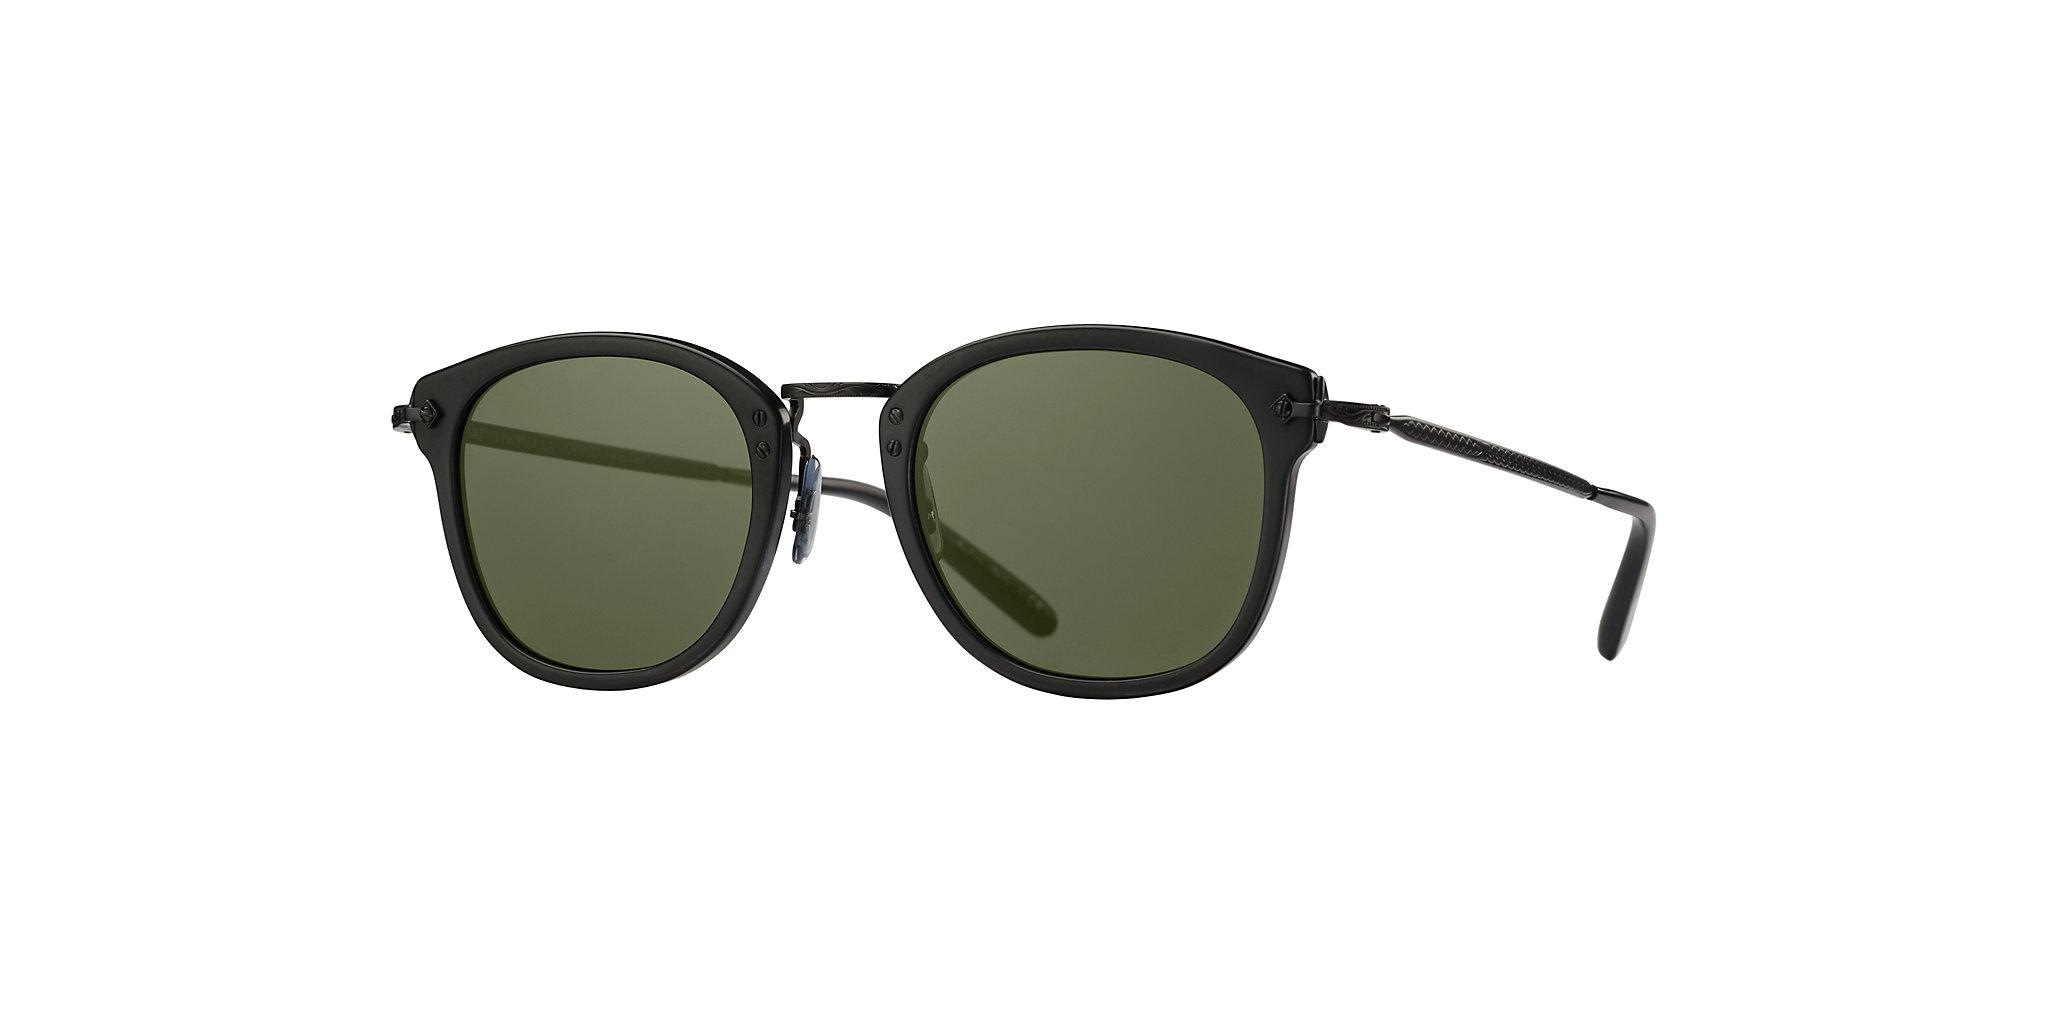 Oliver People's - Occhiale da Sole Unisex, OP-506 Sun, Semi-matte Black/G-15 Matte Black OV5350S 1465/52 C49